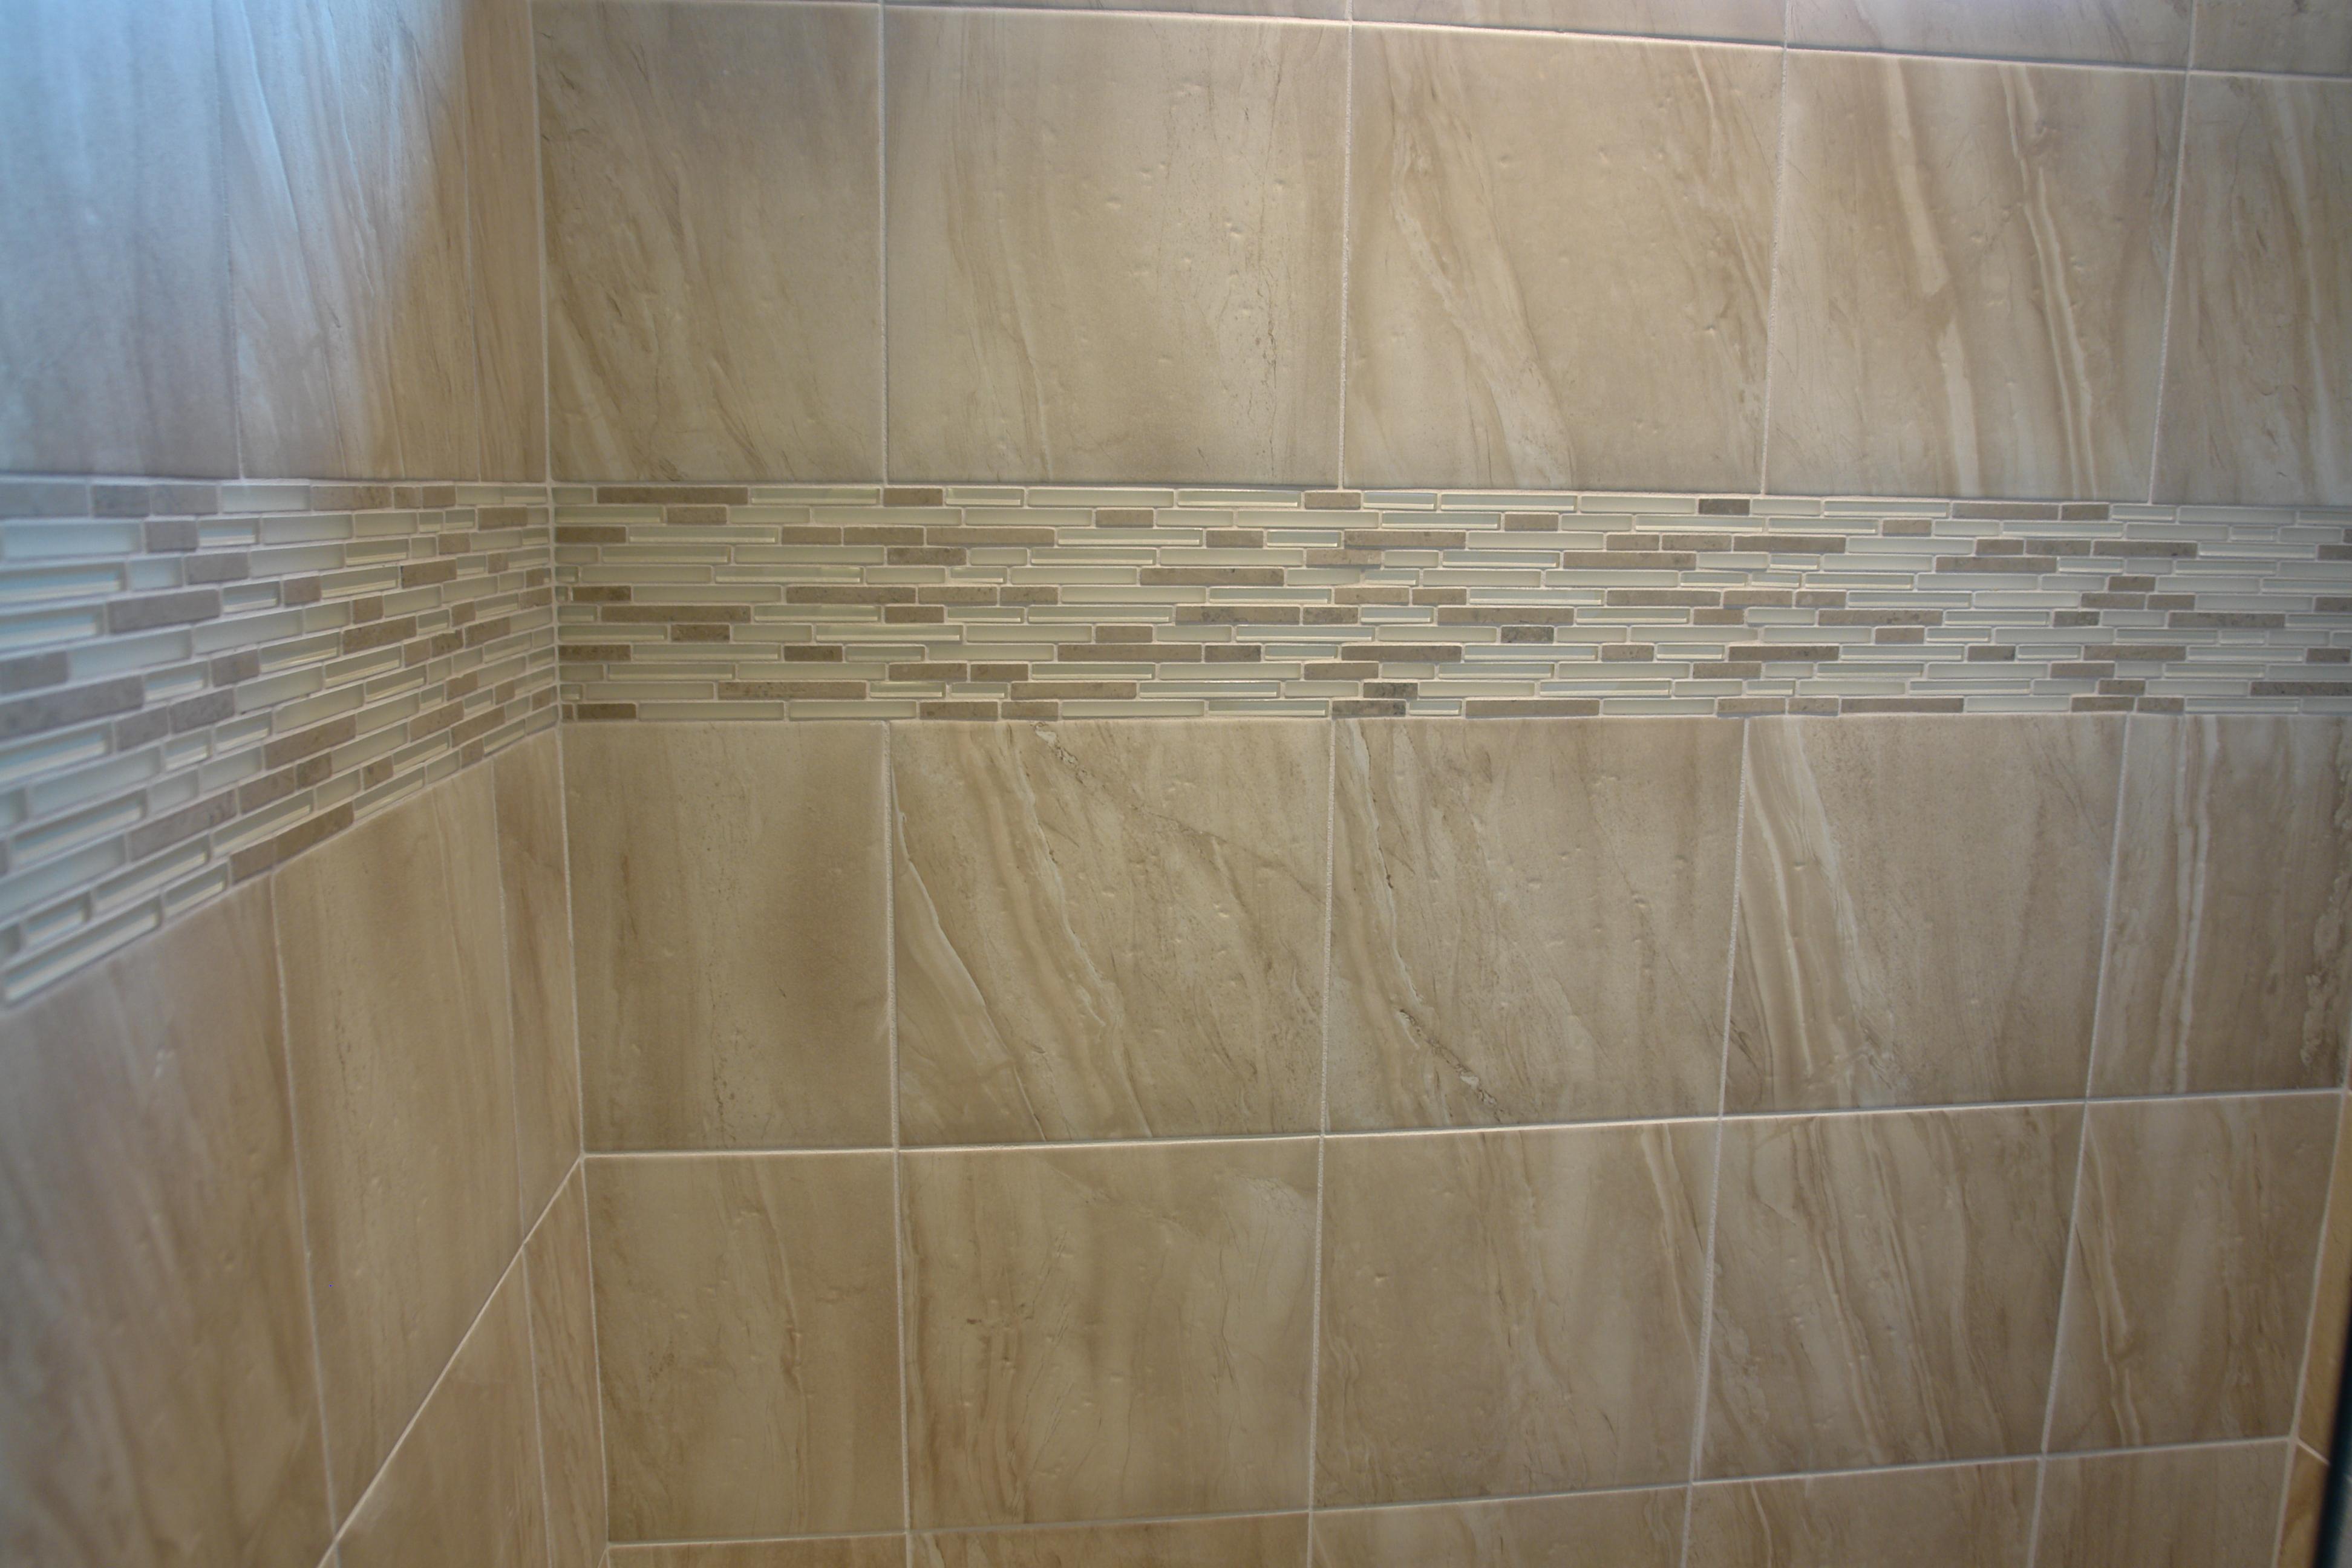 Capell Flooring and Interiors, Tile Flooring Tile Showers Boise Idaho